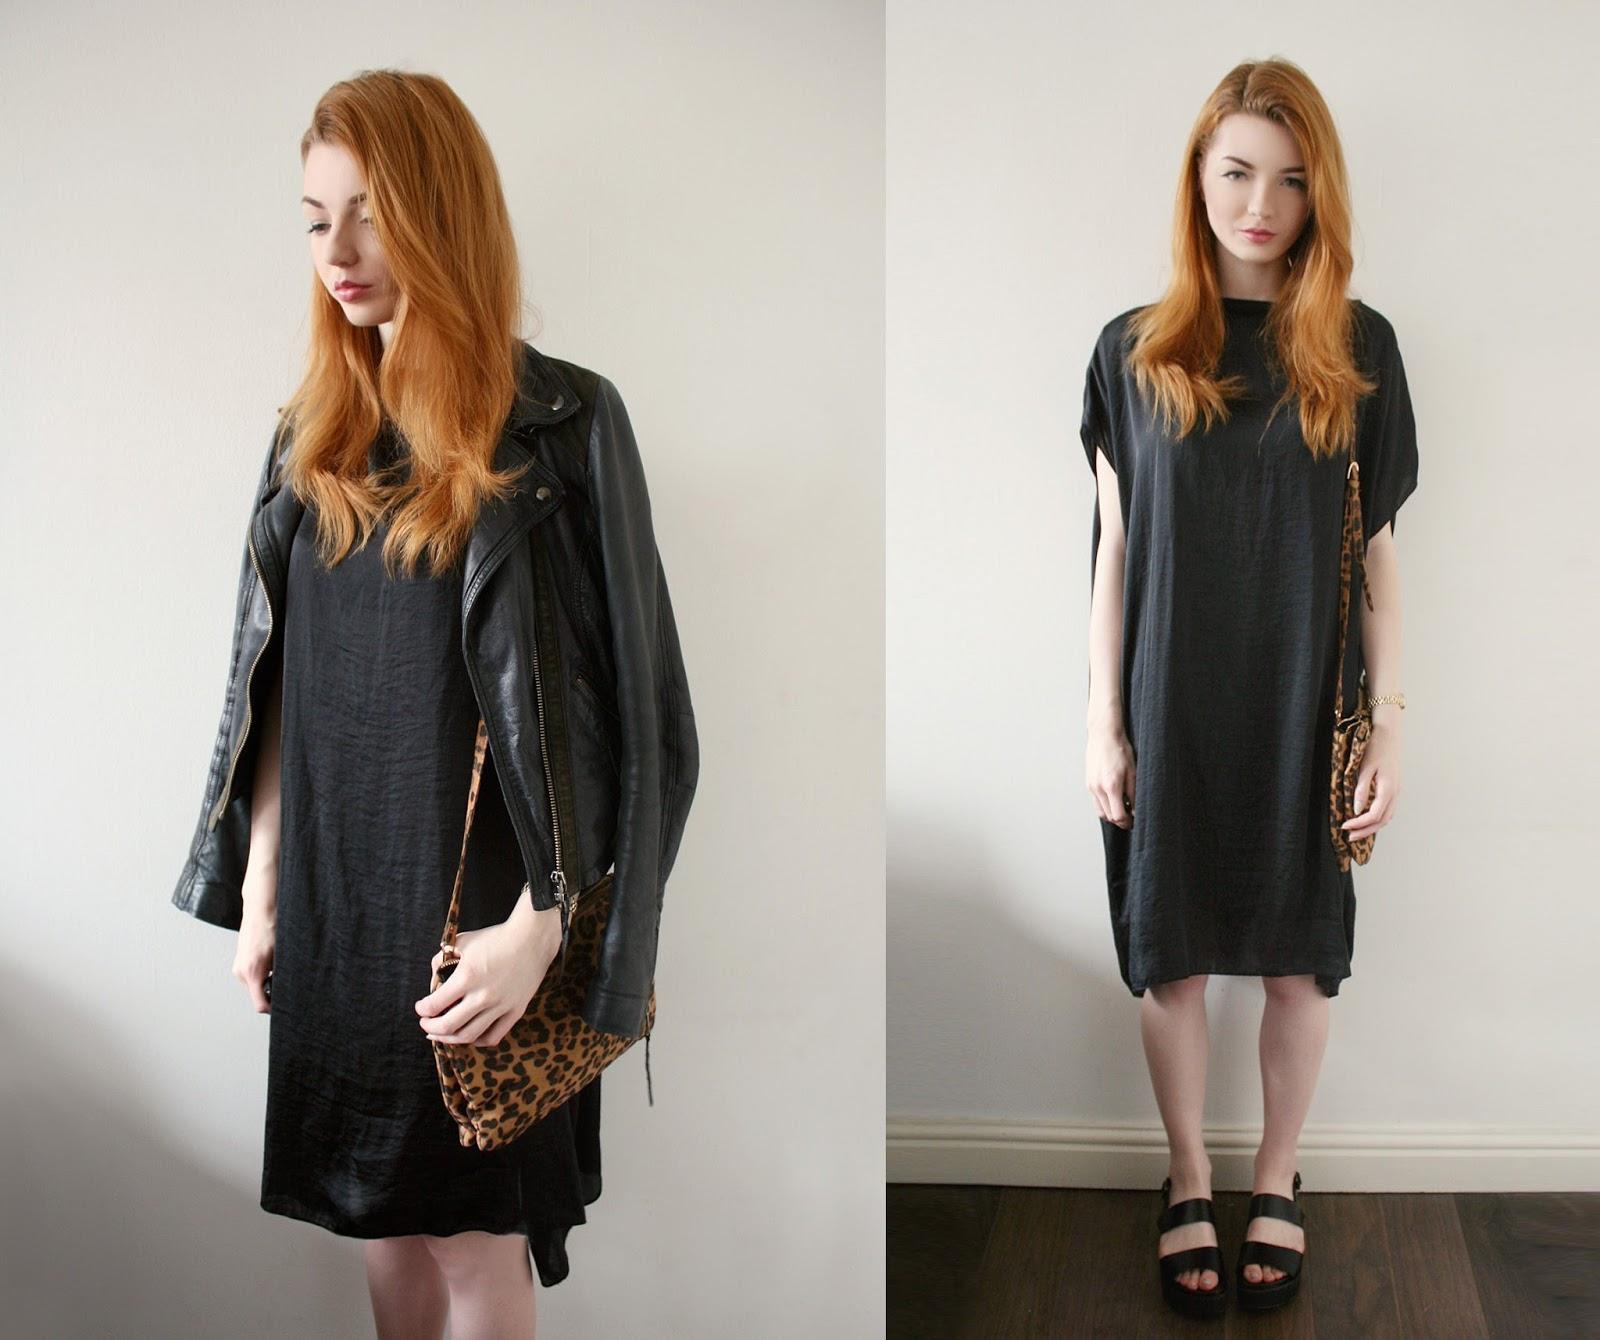 70dab3e47ab Dress – Cheap Monday @ Koshka* | Sandals – New Look* | Jacket – Topshop |  Bag – Primark